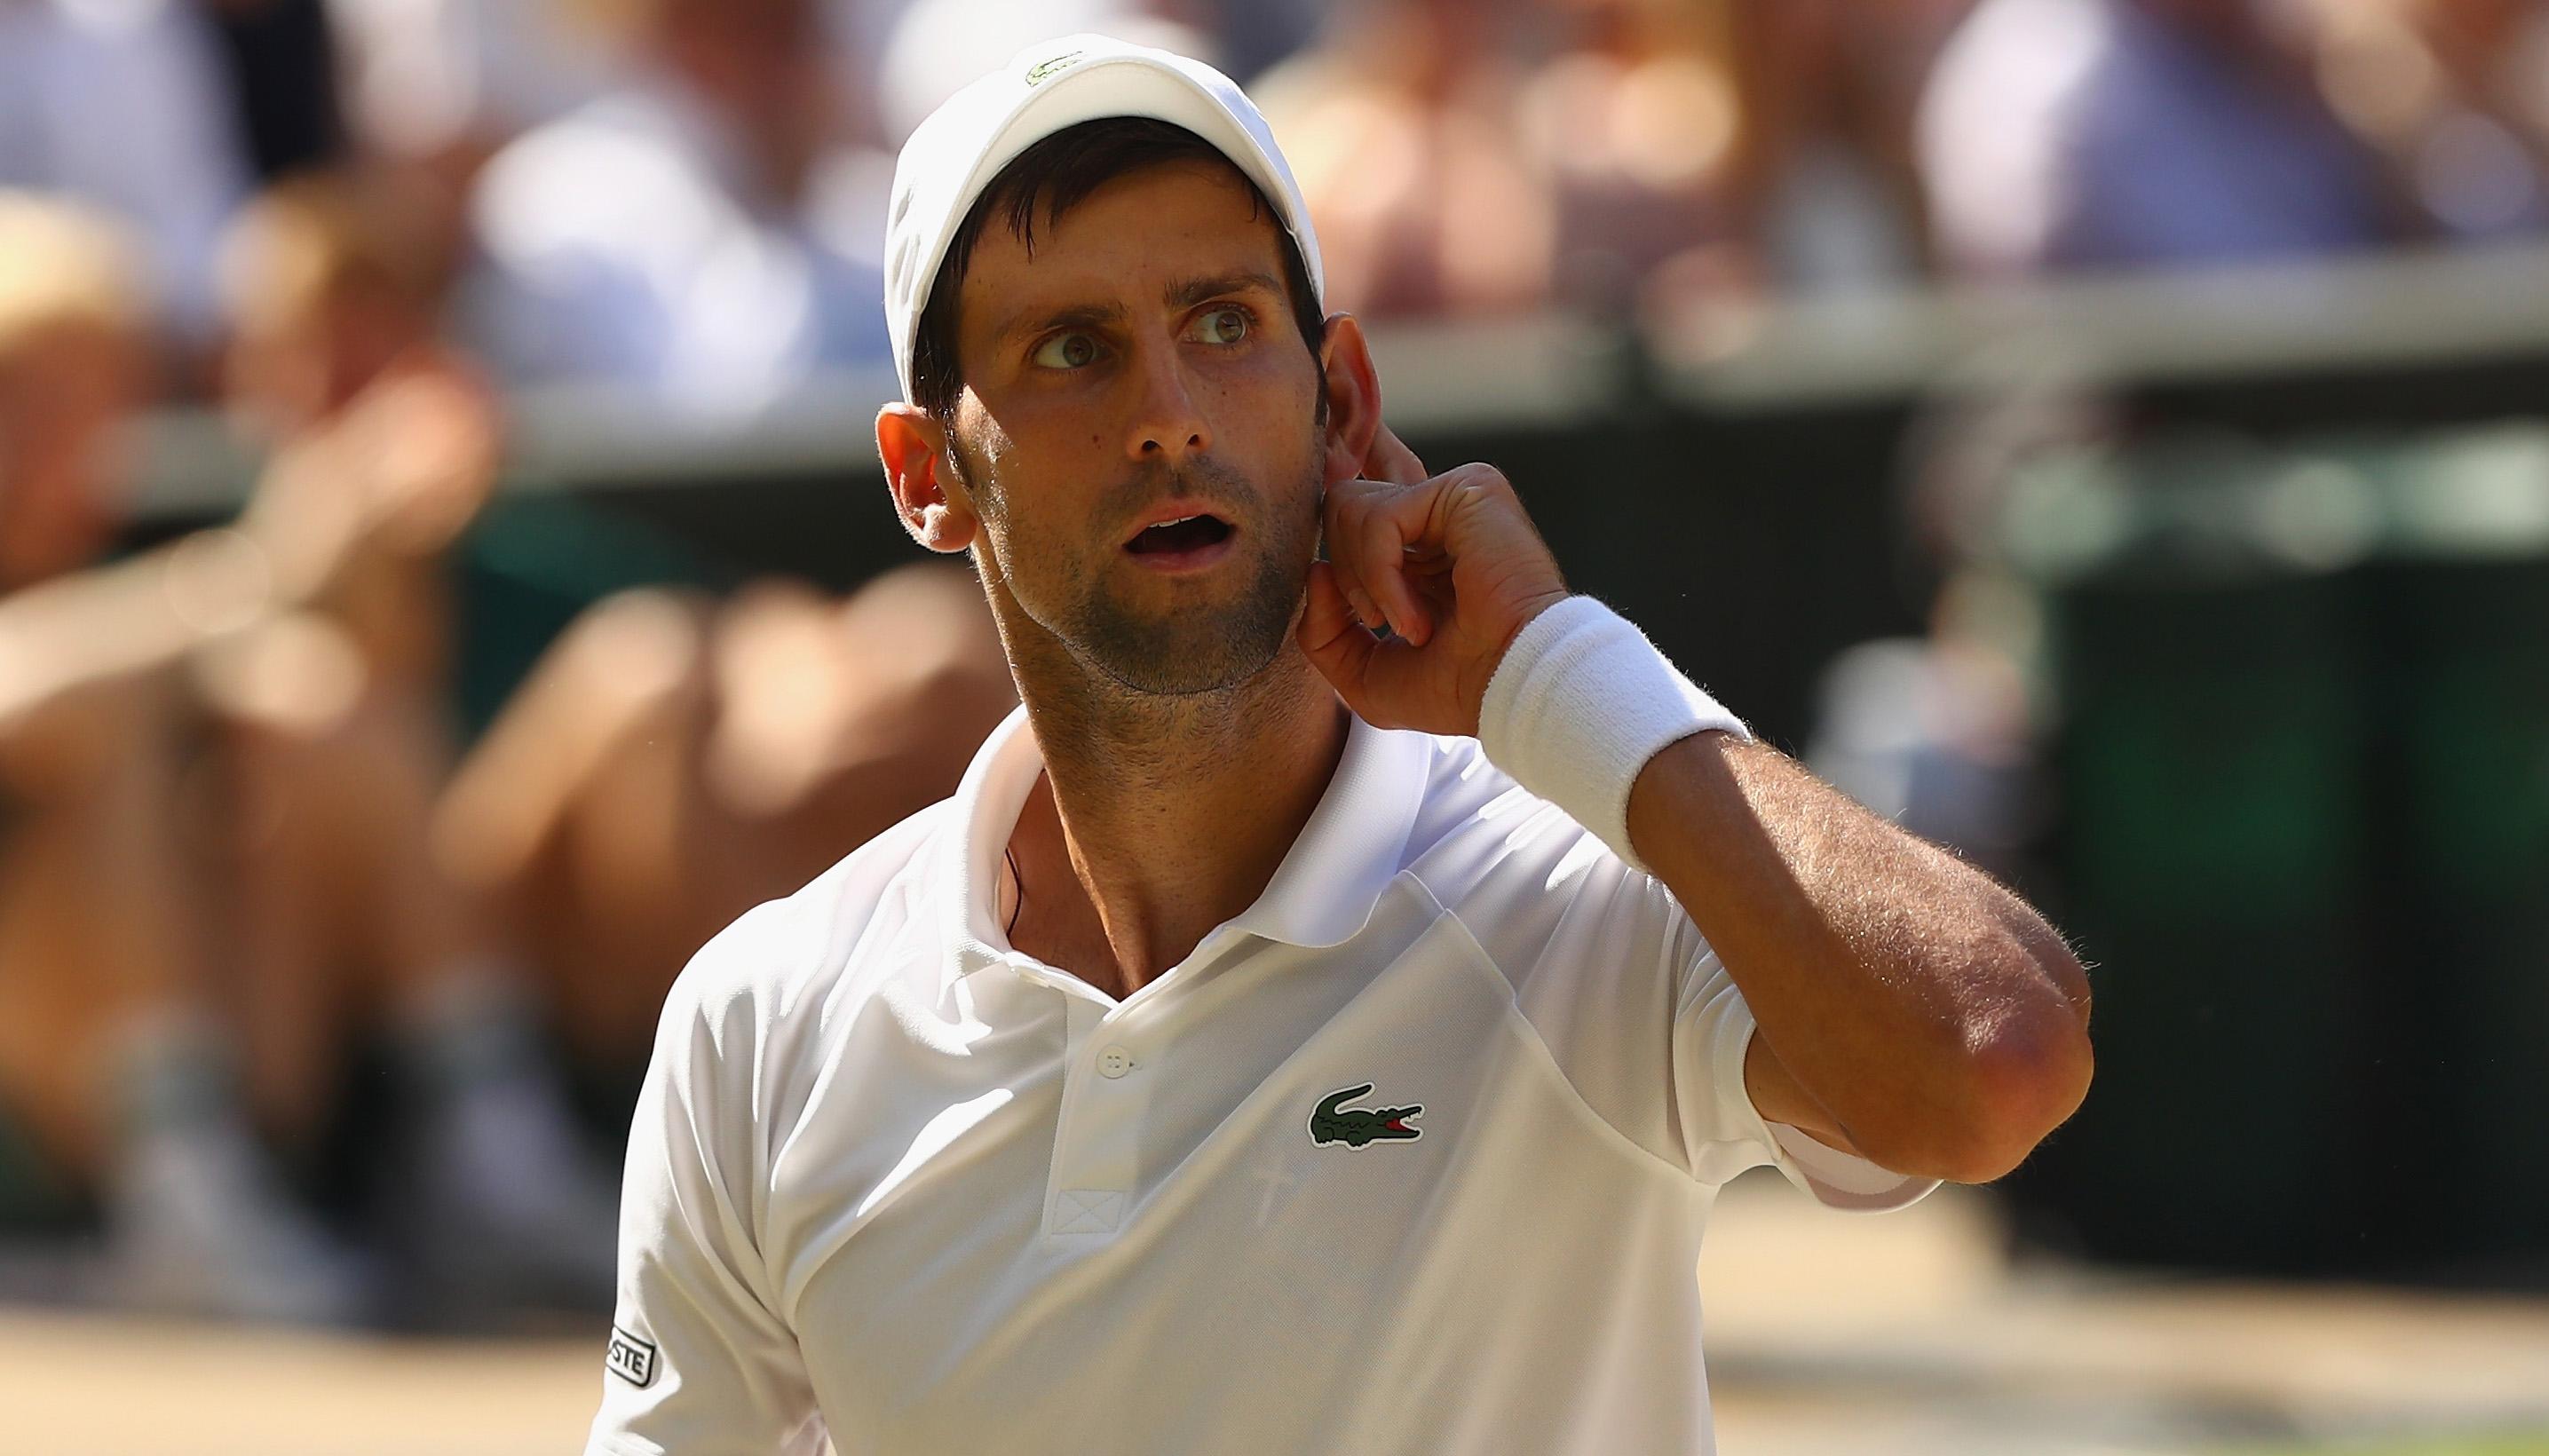 Djokovic-Coup hält die Youngster im Wartestand